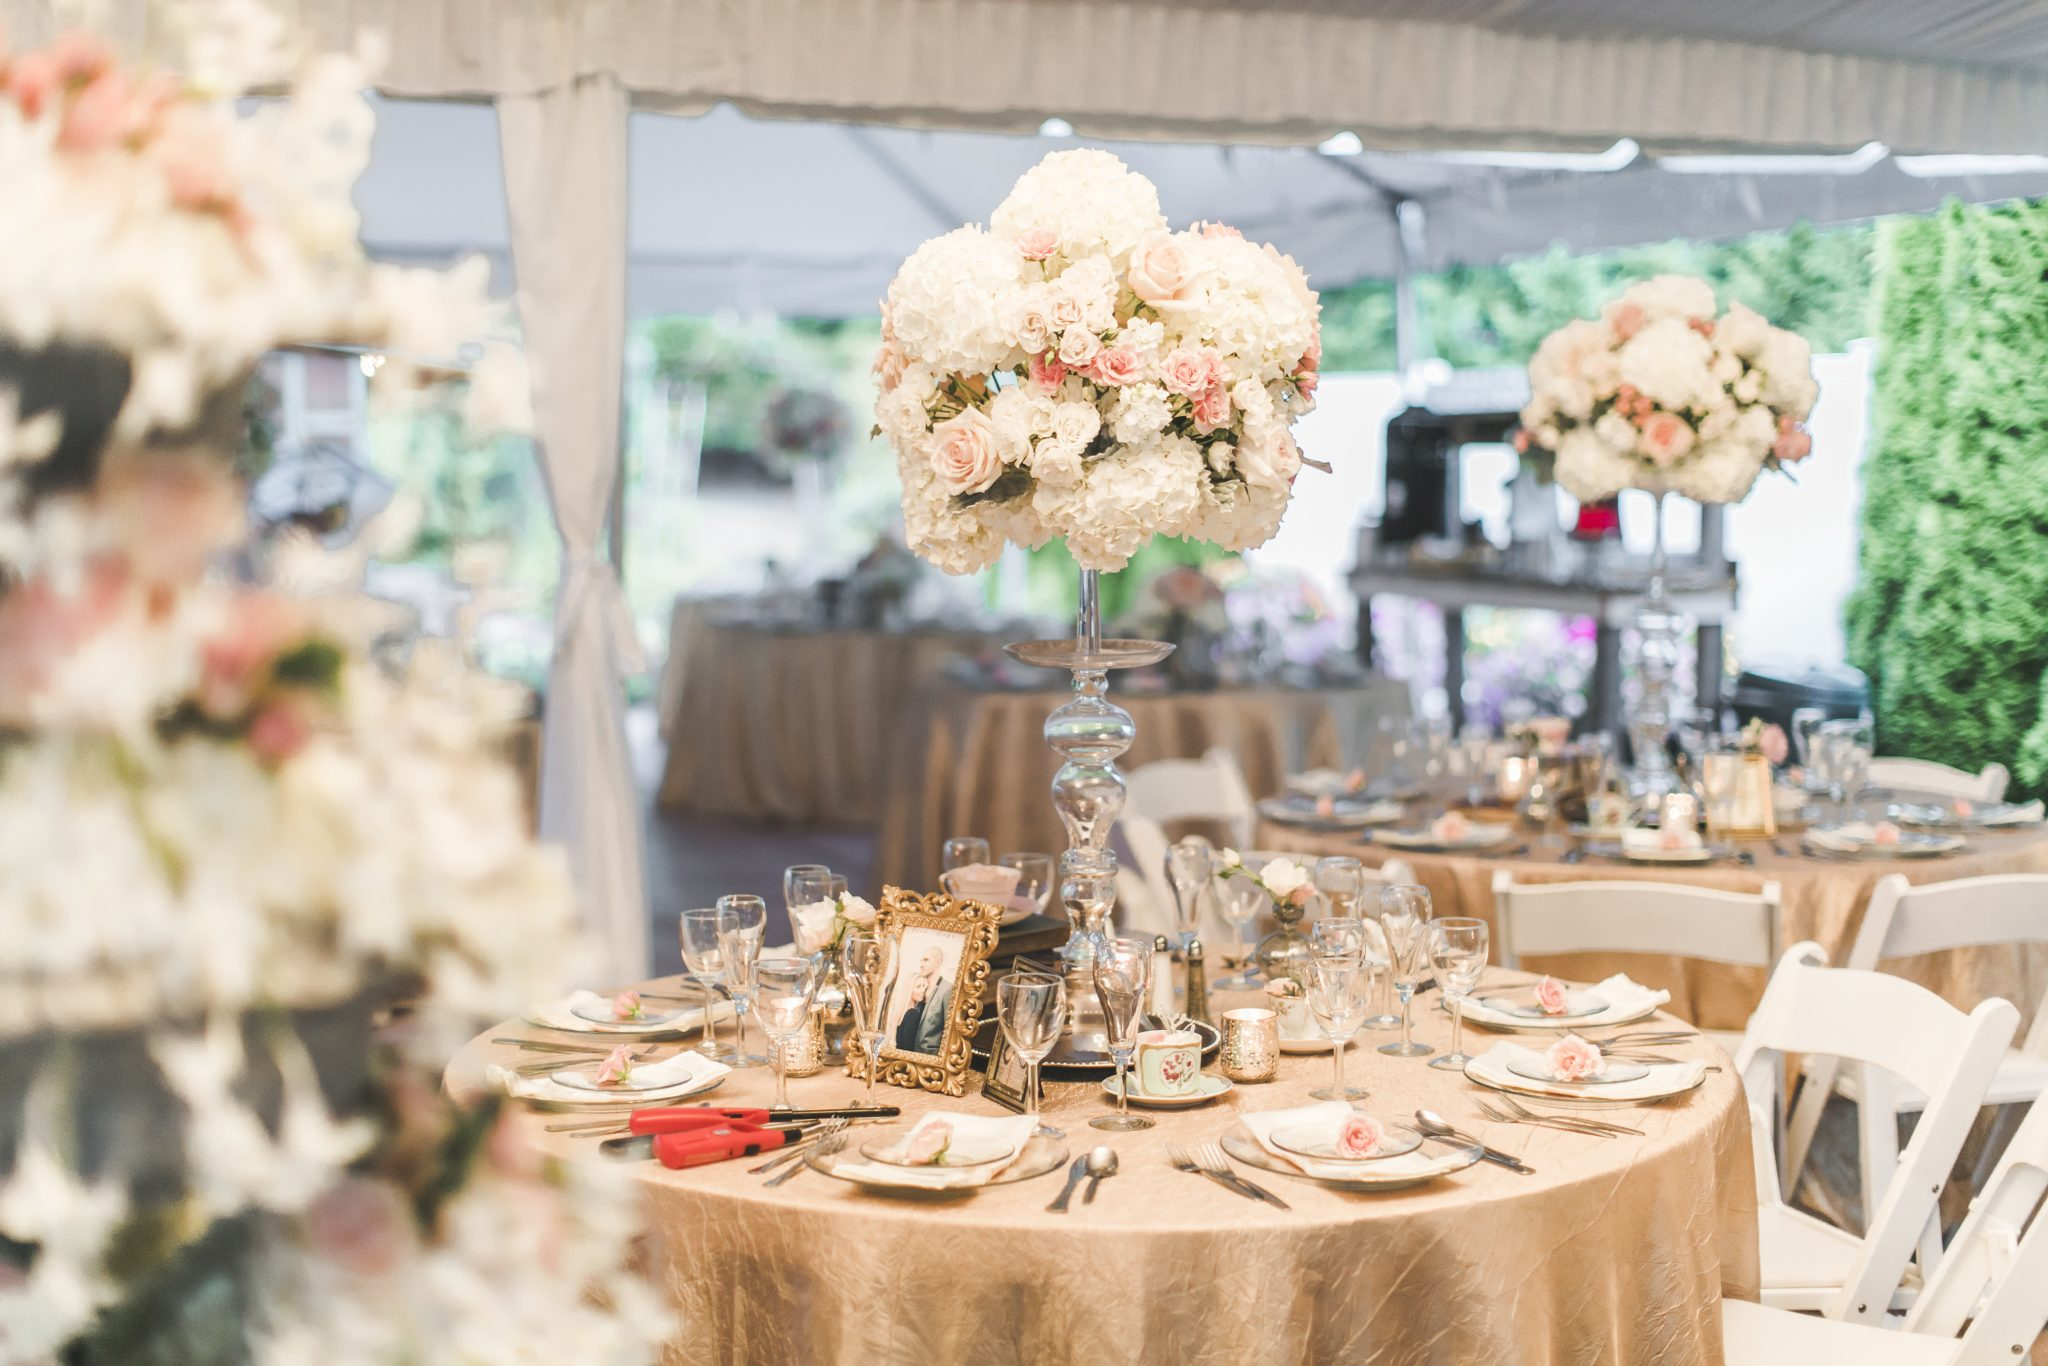 6Seattle-Floral-Design-wedding-reception-centerpiece-glass-candl ...